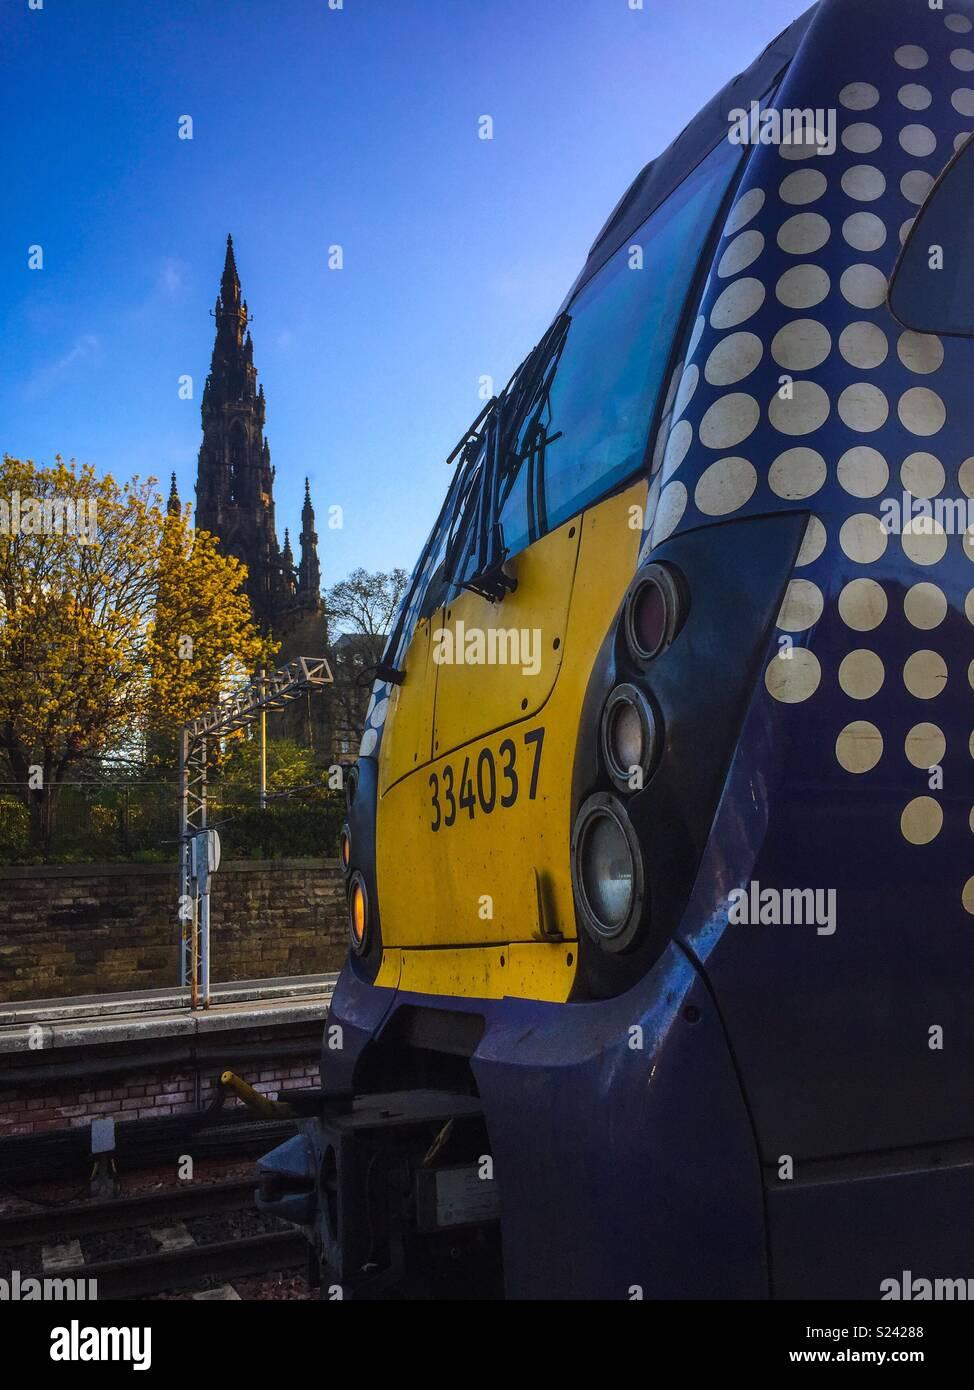 Train in Edinburgh, Scotland - Stock Image